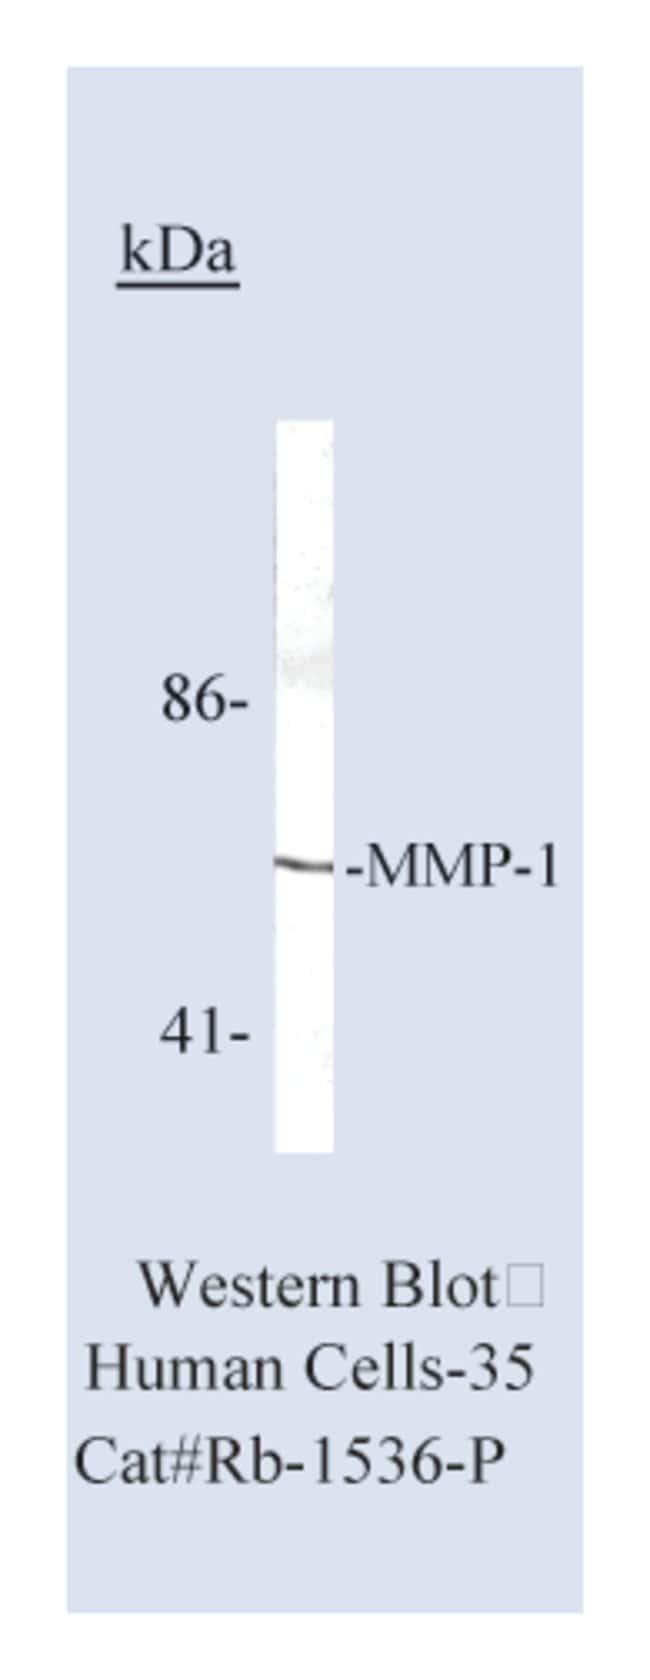 Thermo Scientific Lab Vision MMP-1 (Collagenase-1) Ab-6, Rabbit Polyclonal